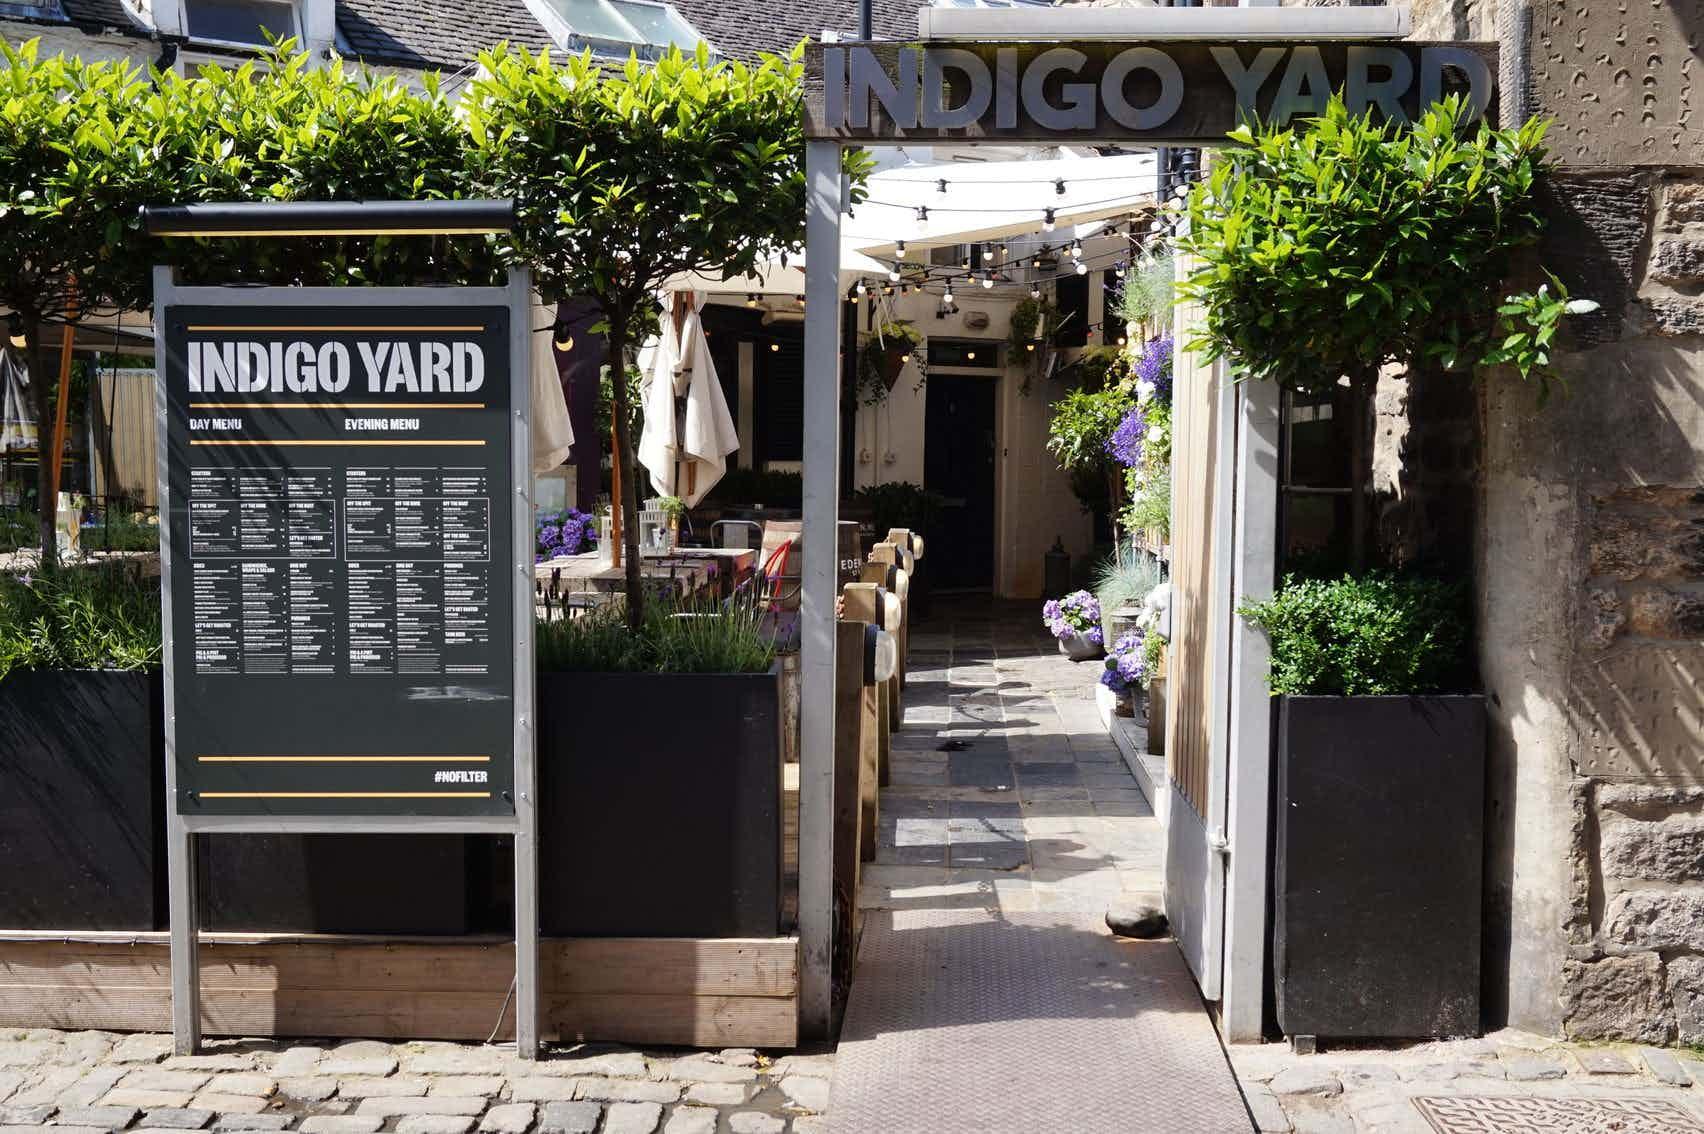 Exclusive full Private hire, Indigo Yard